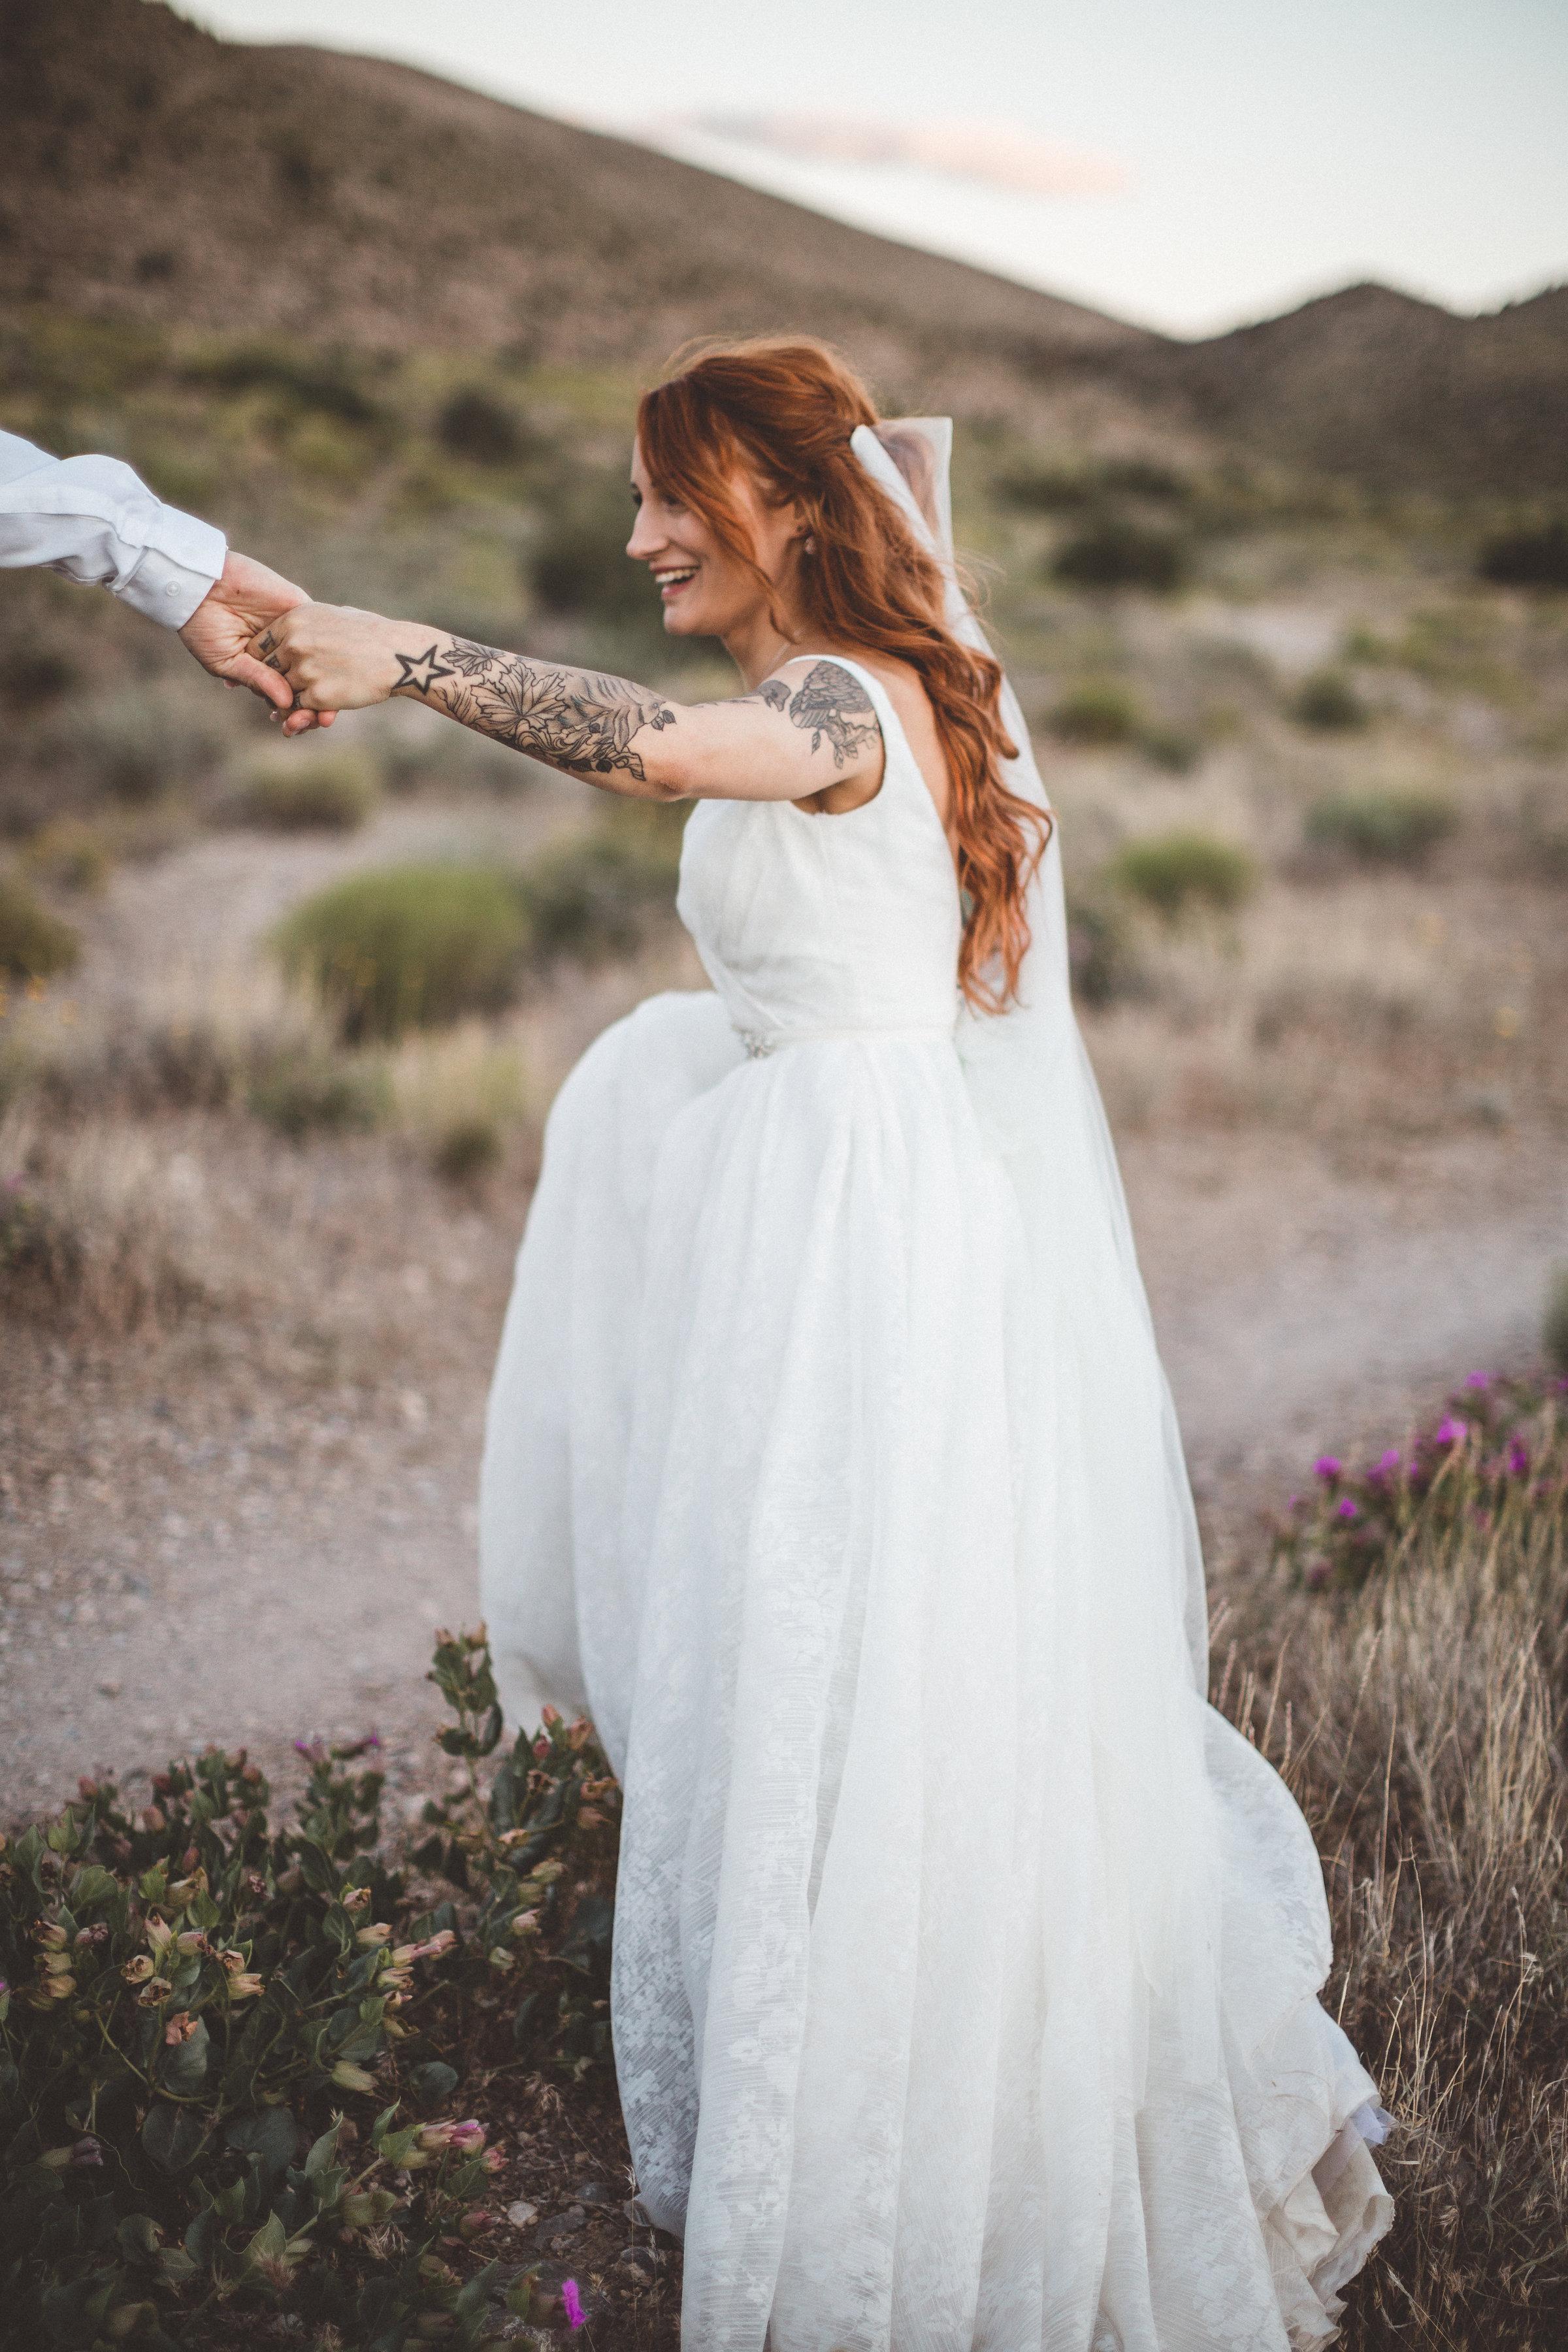 nicoletta-and-adams-rad-las-vegas-desert-elopement39.jpg